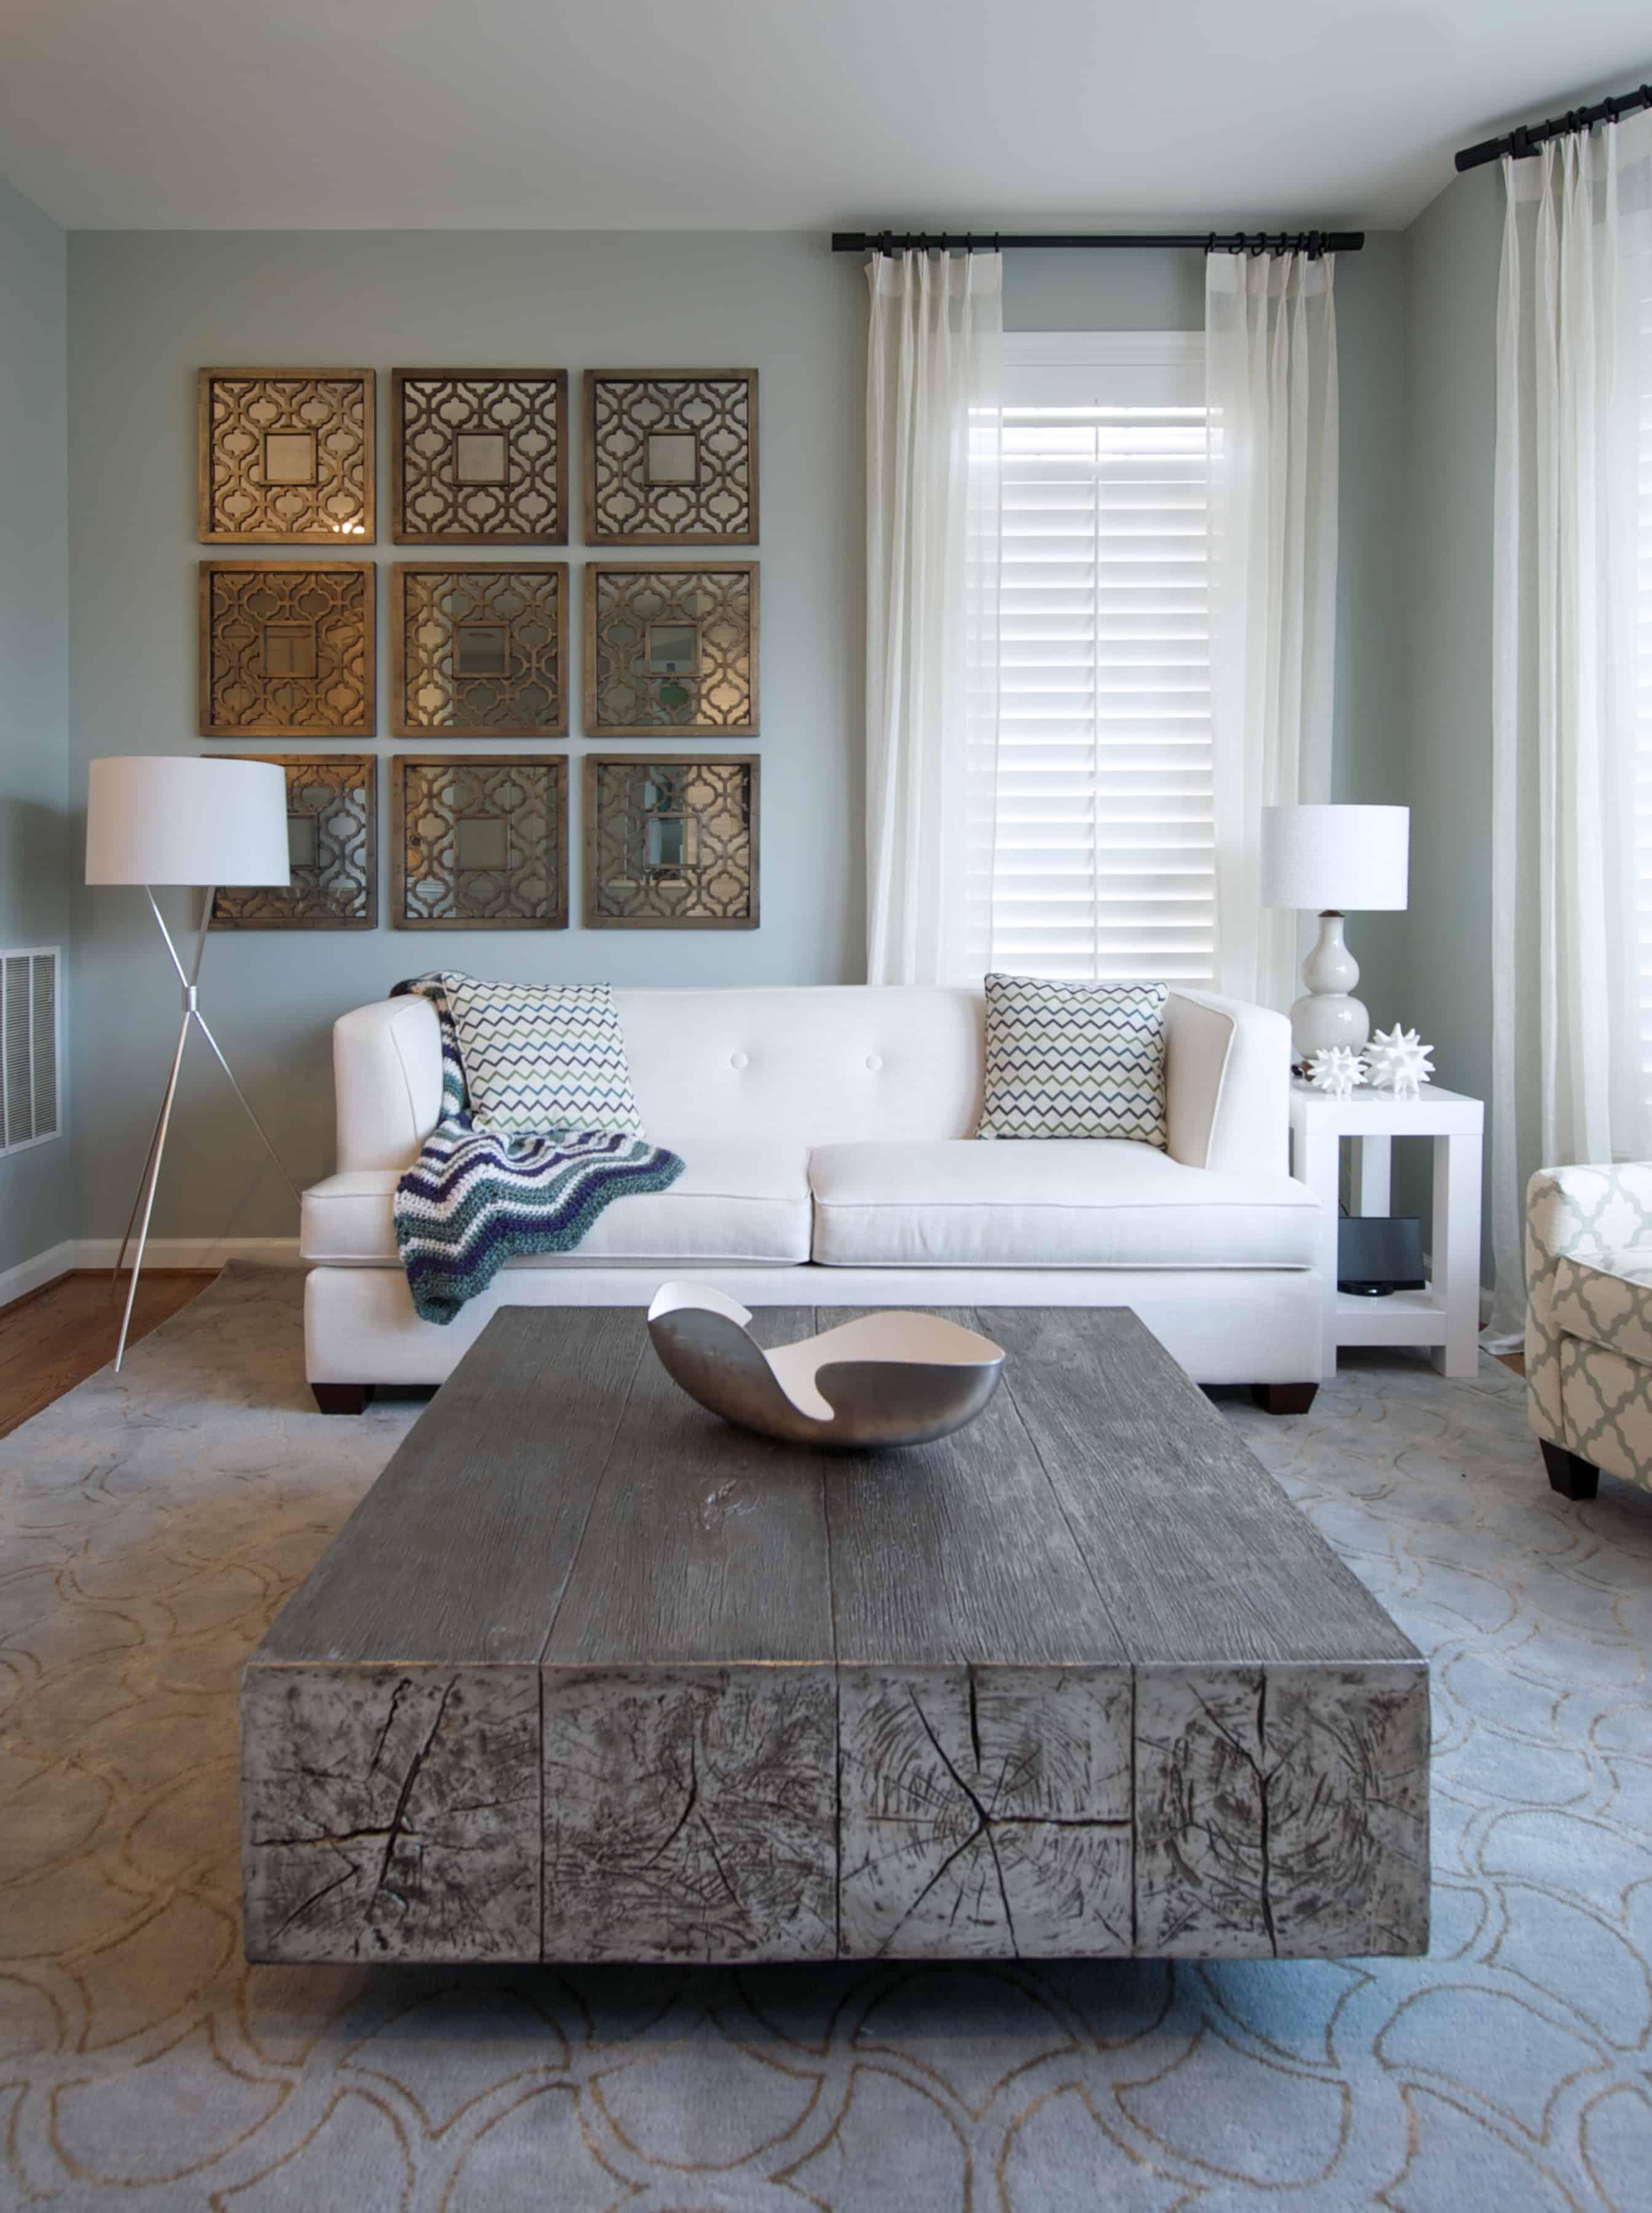 vip day service olamar interiors services interior design